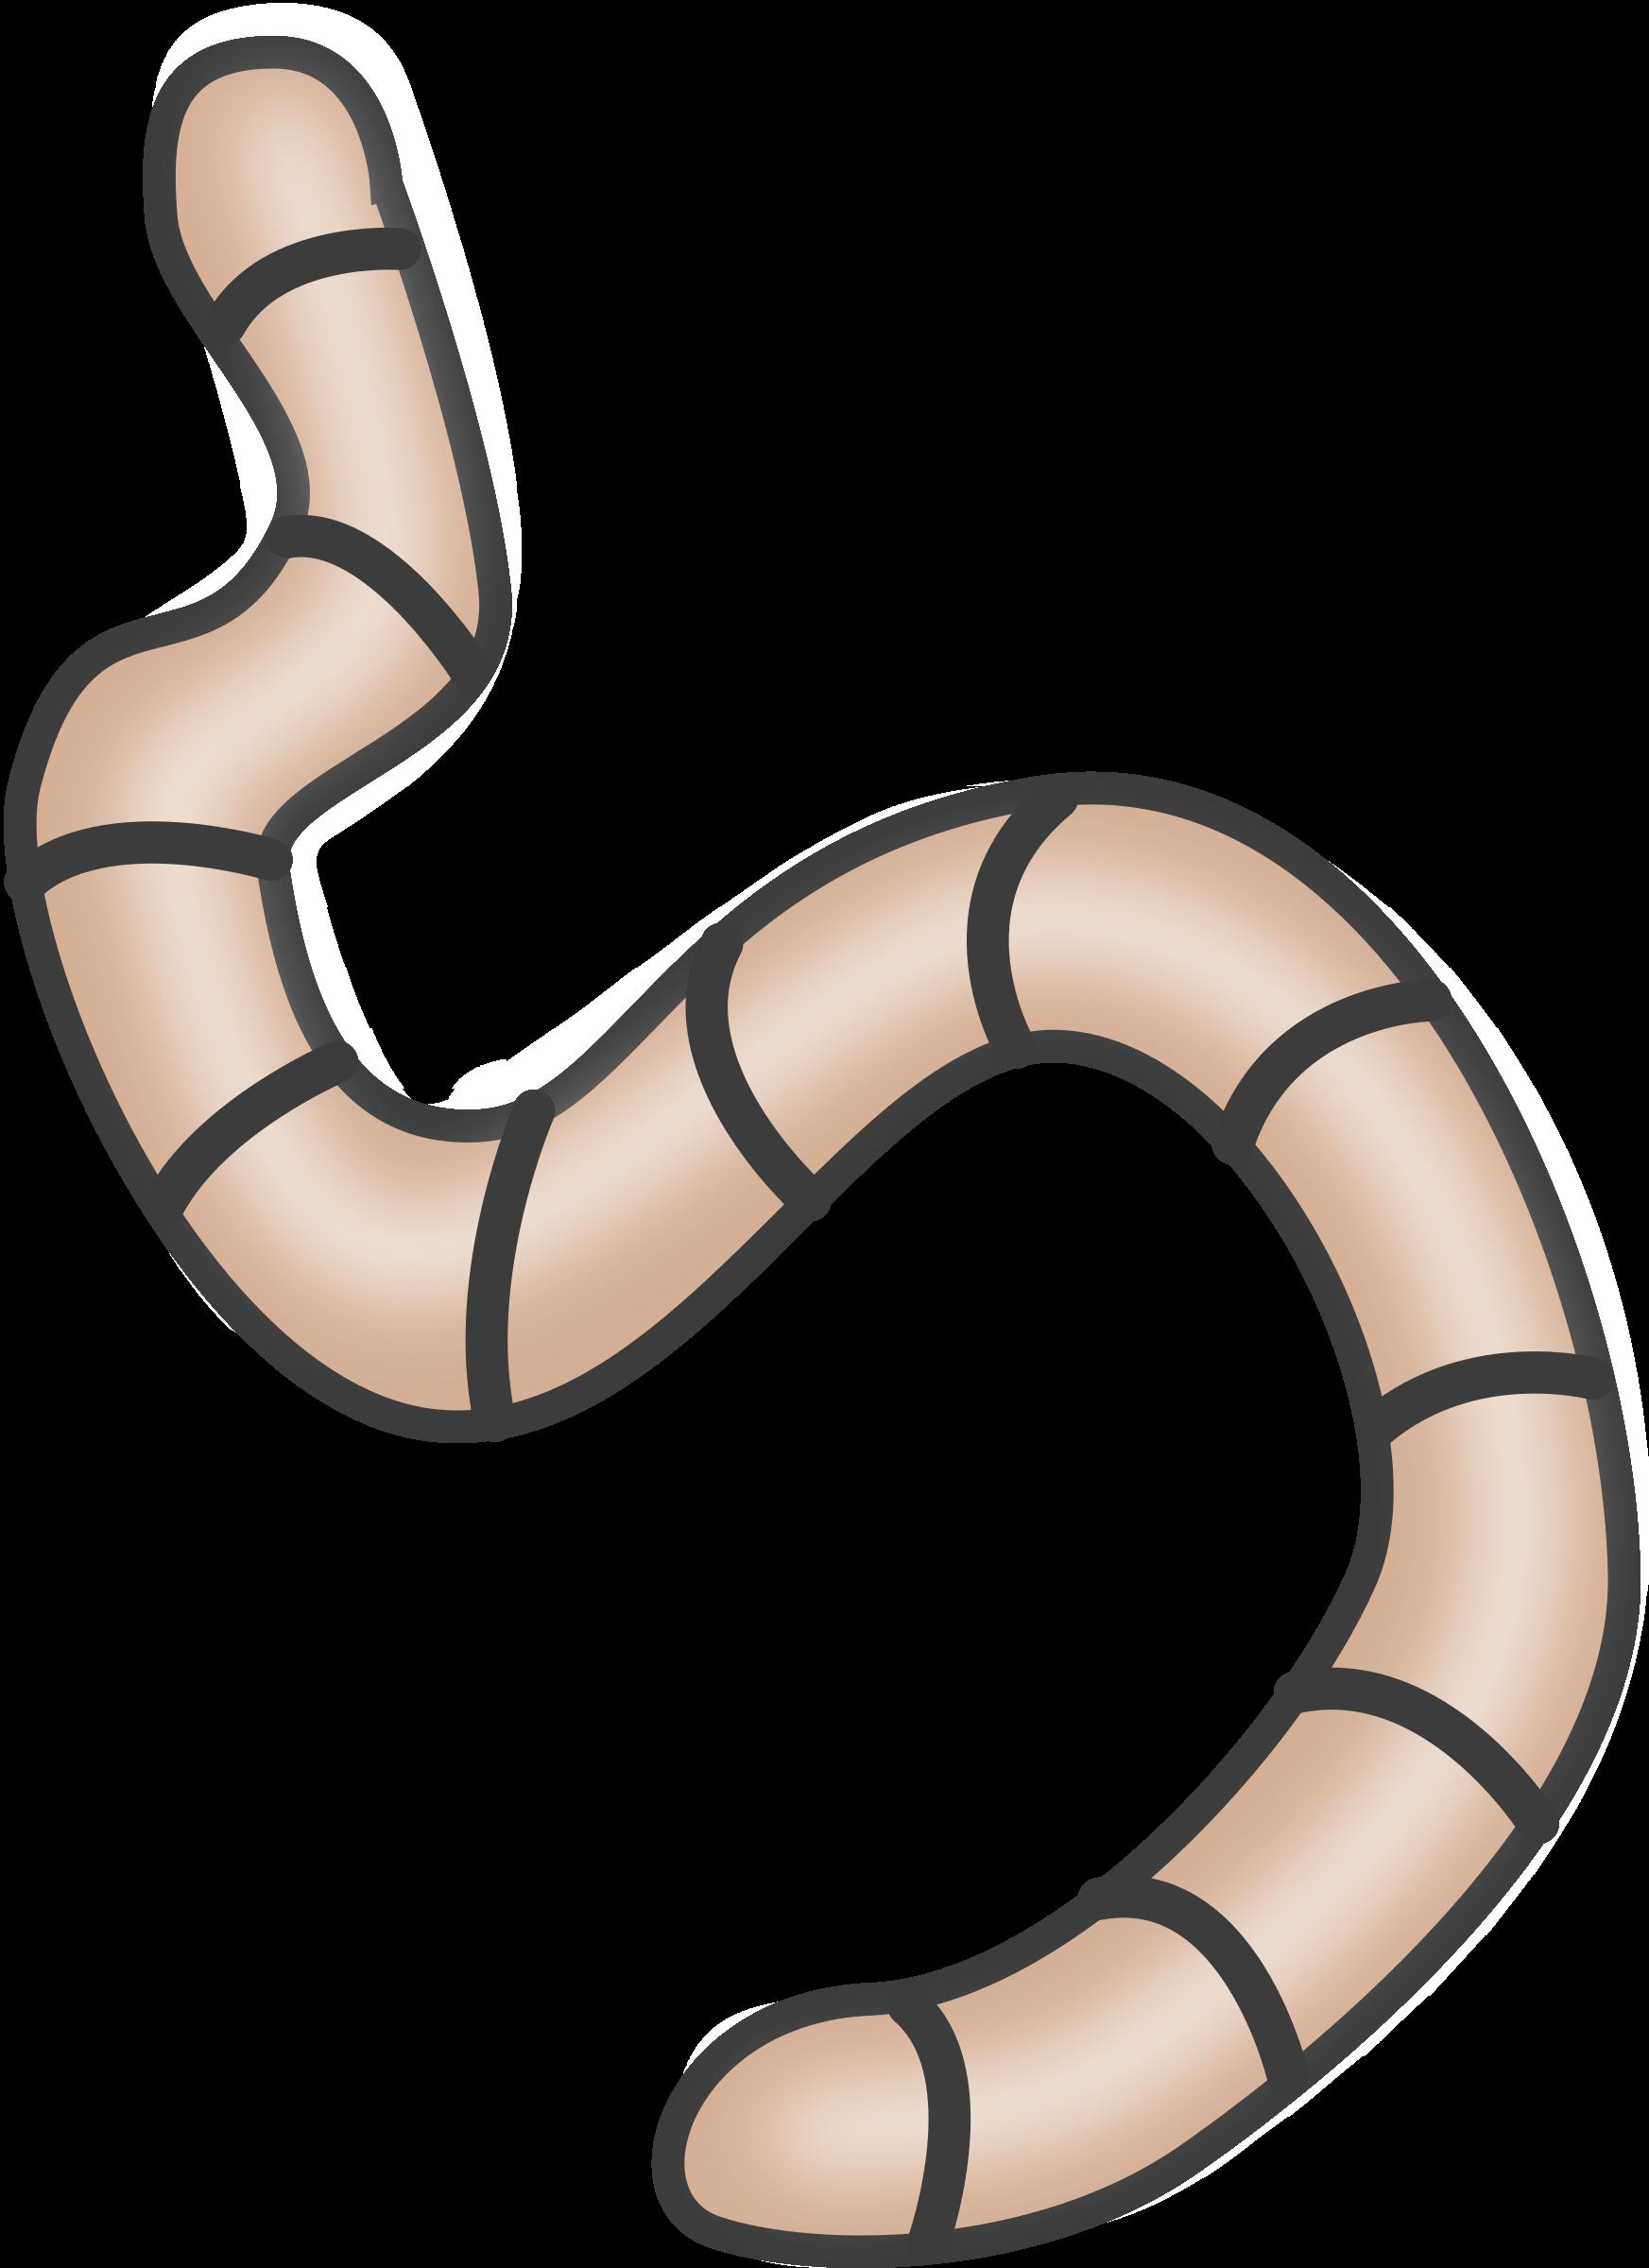 Worm clipart detritivore, Worm detritivore Transparent FREE.